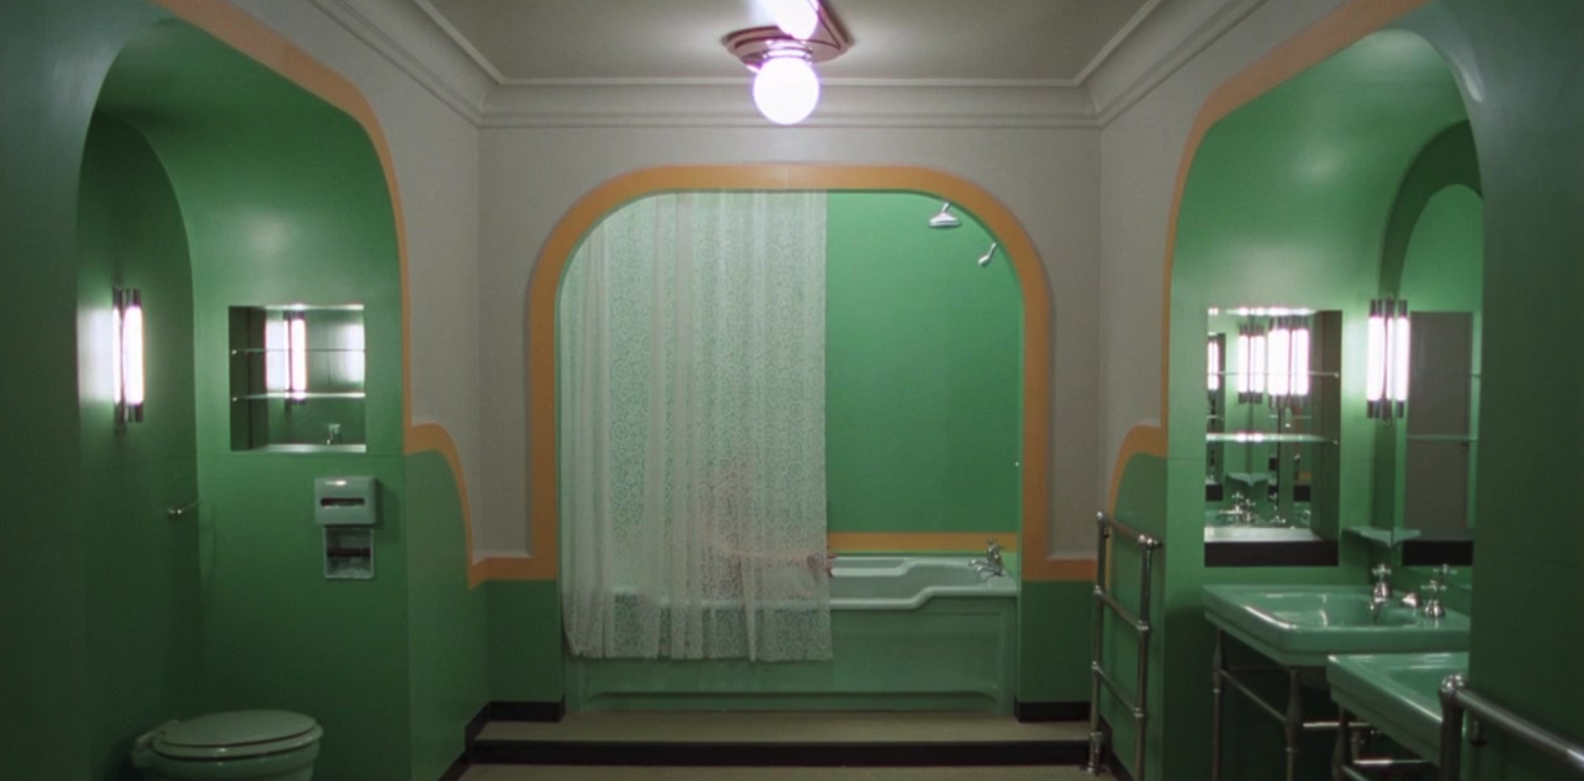 Room 237 Bathroom Scene Lia Beldam